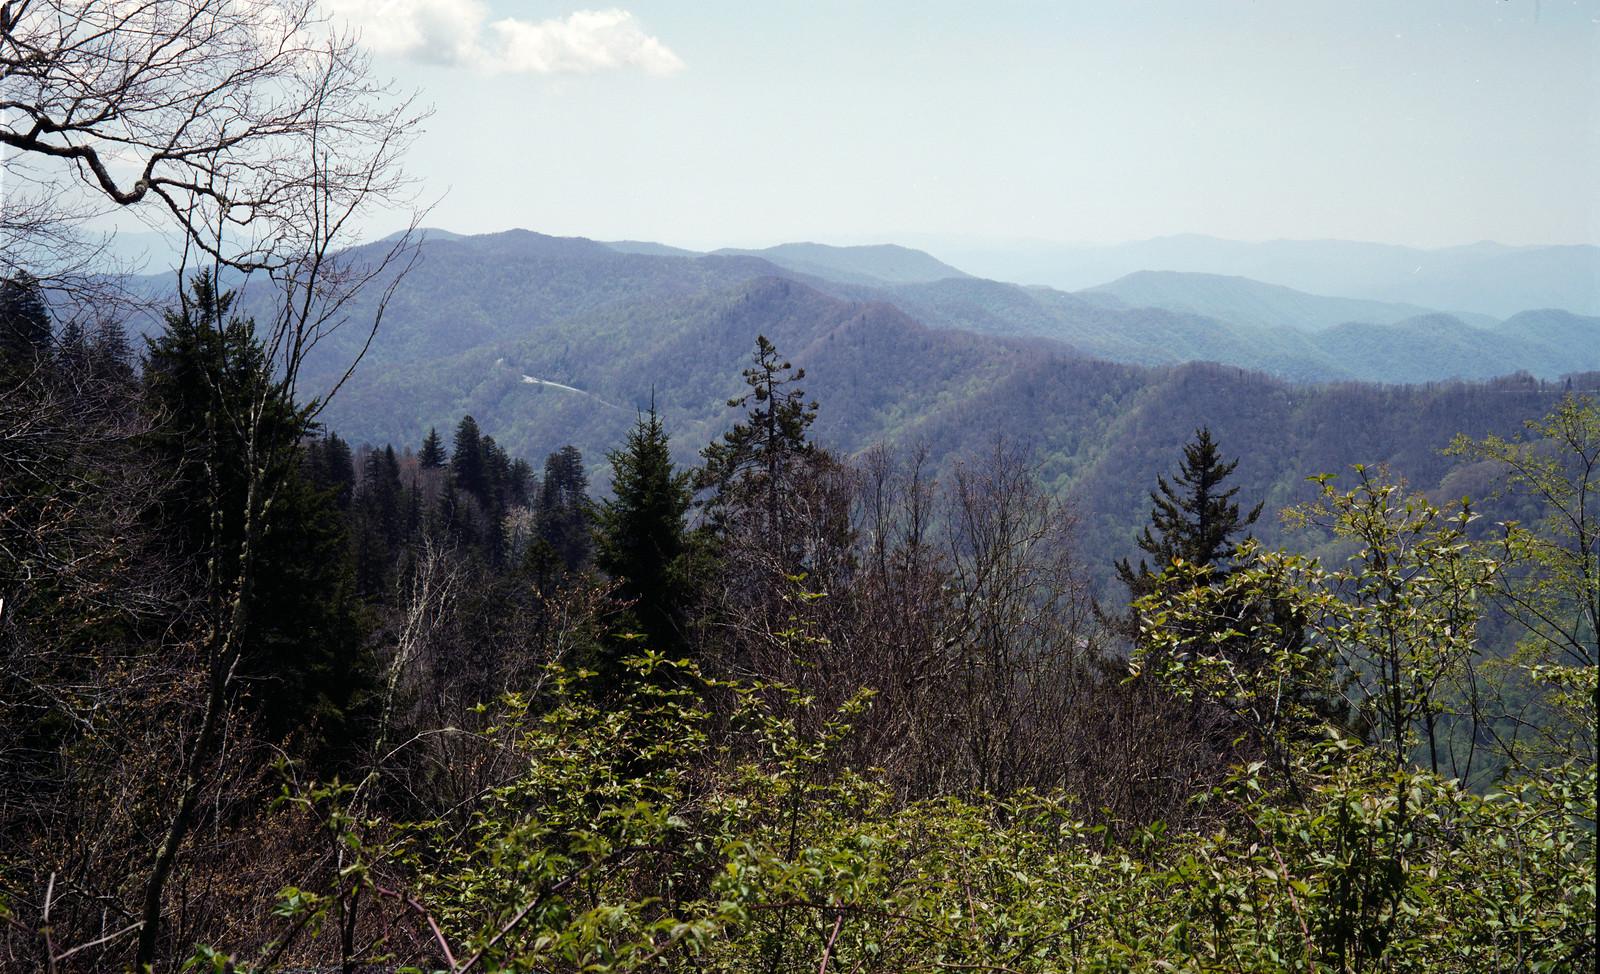 Smokey Mountains from Newfound Gap